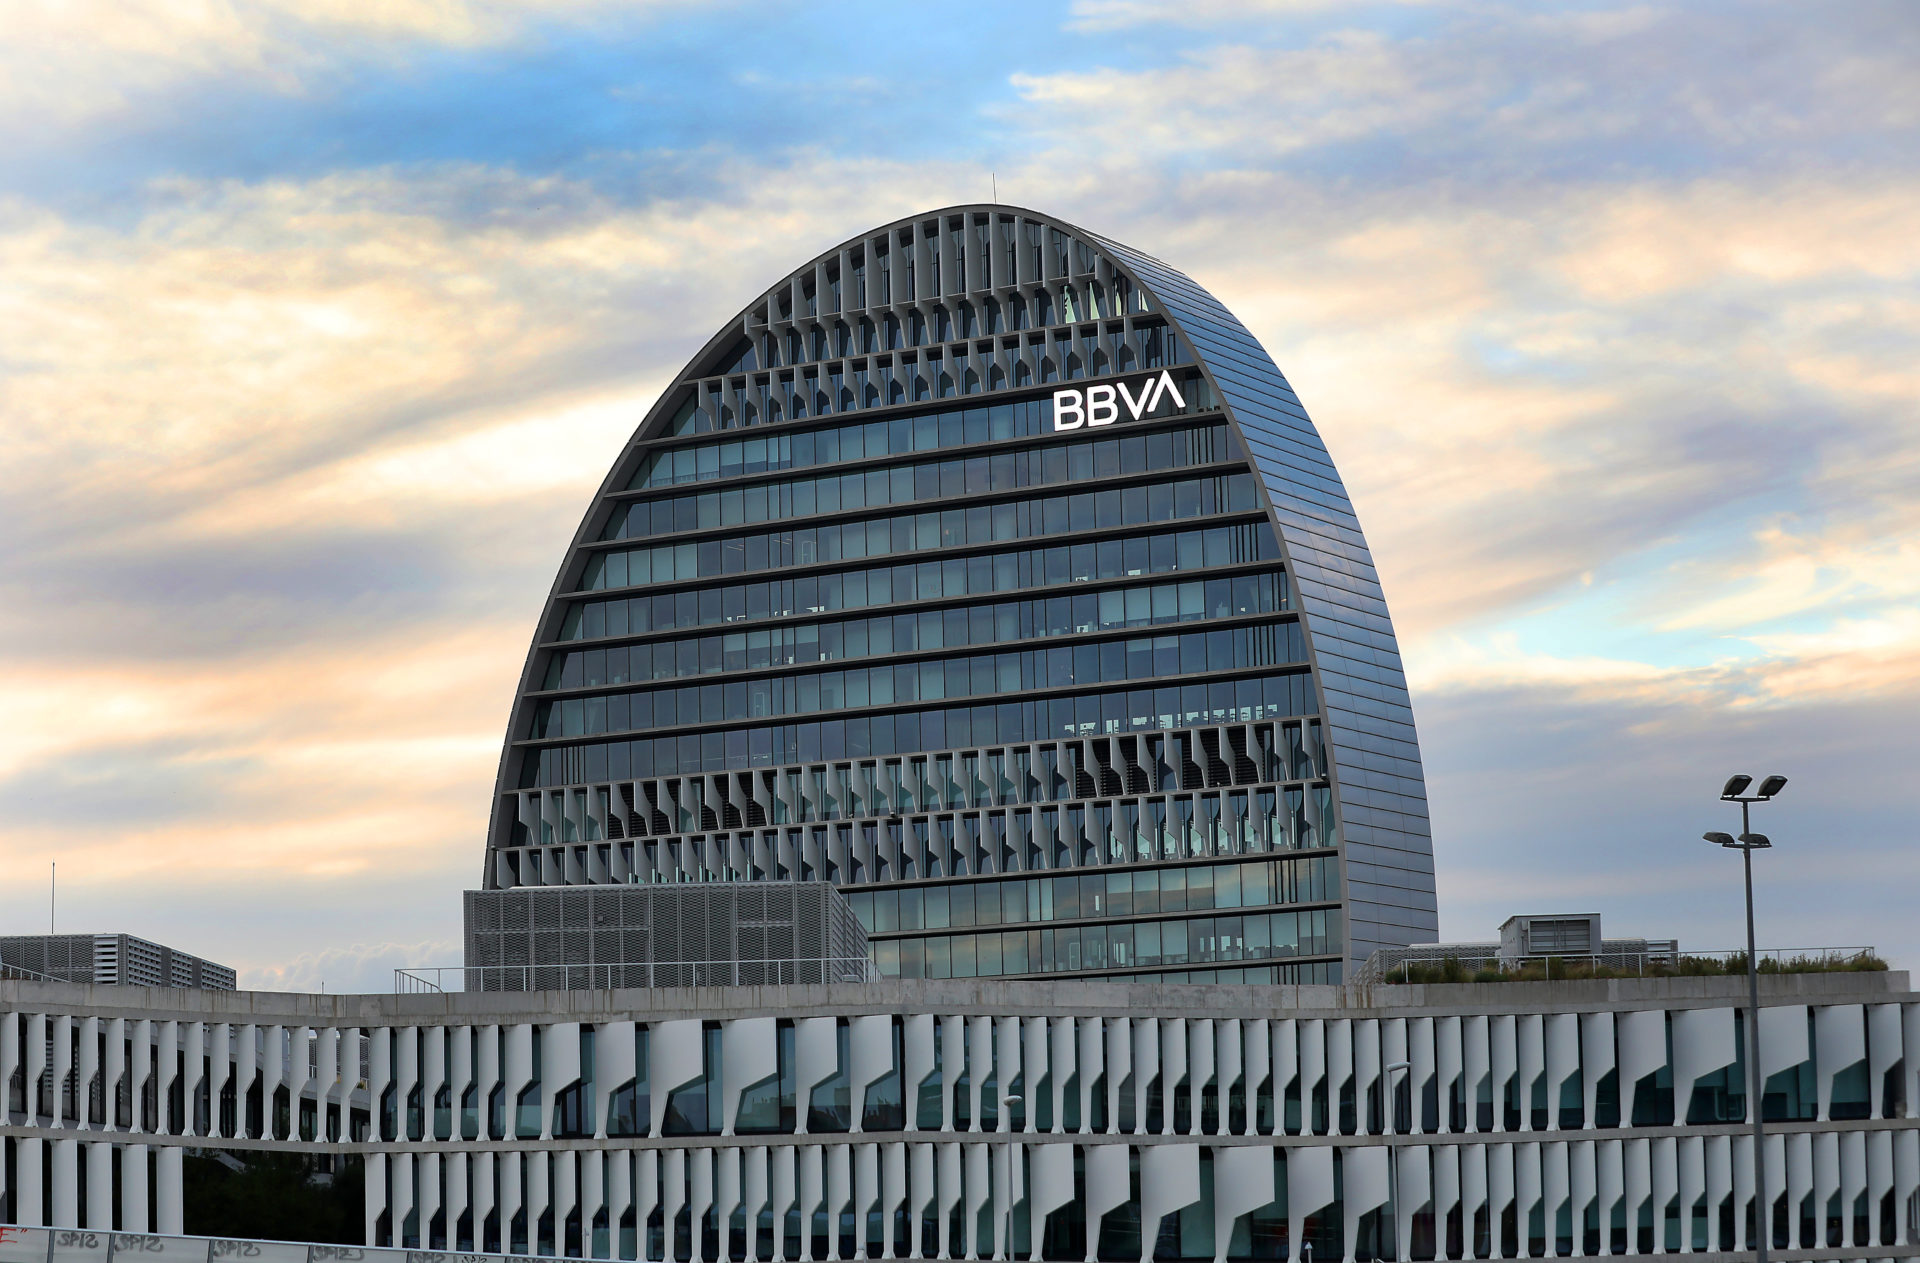 https://accionistaseinversores.bbva.com/wp-content/uploads/2019/11/ciudad-vela-nuevo-logo-bbva-1920x1263.jpg